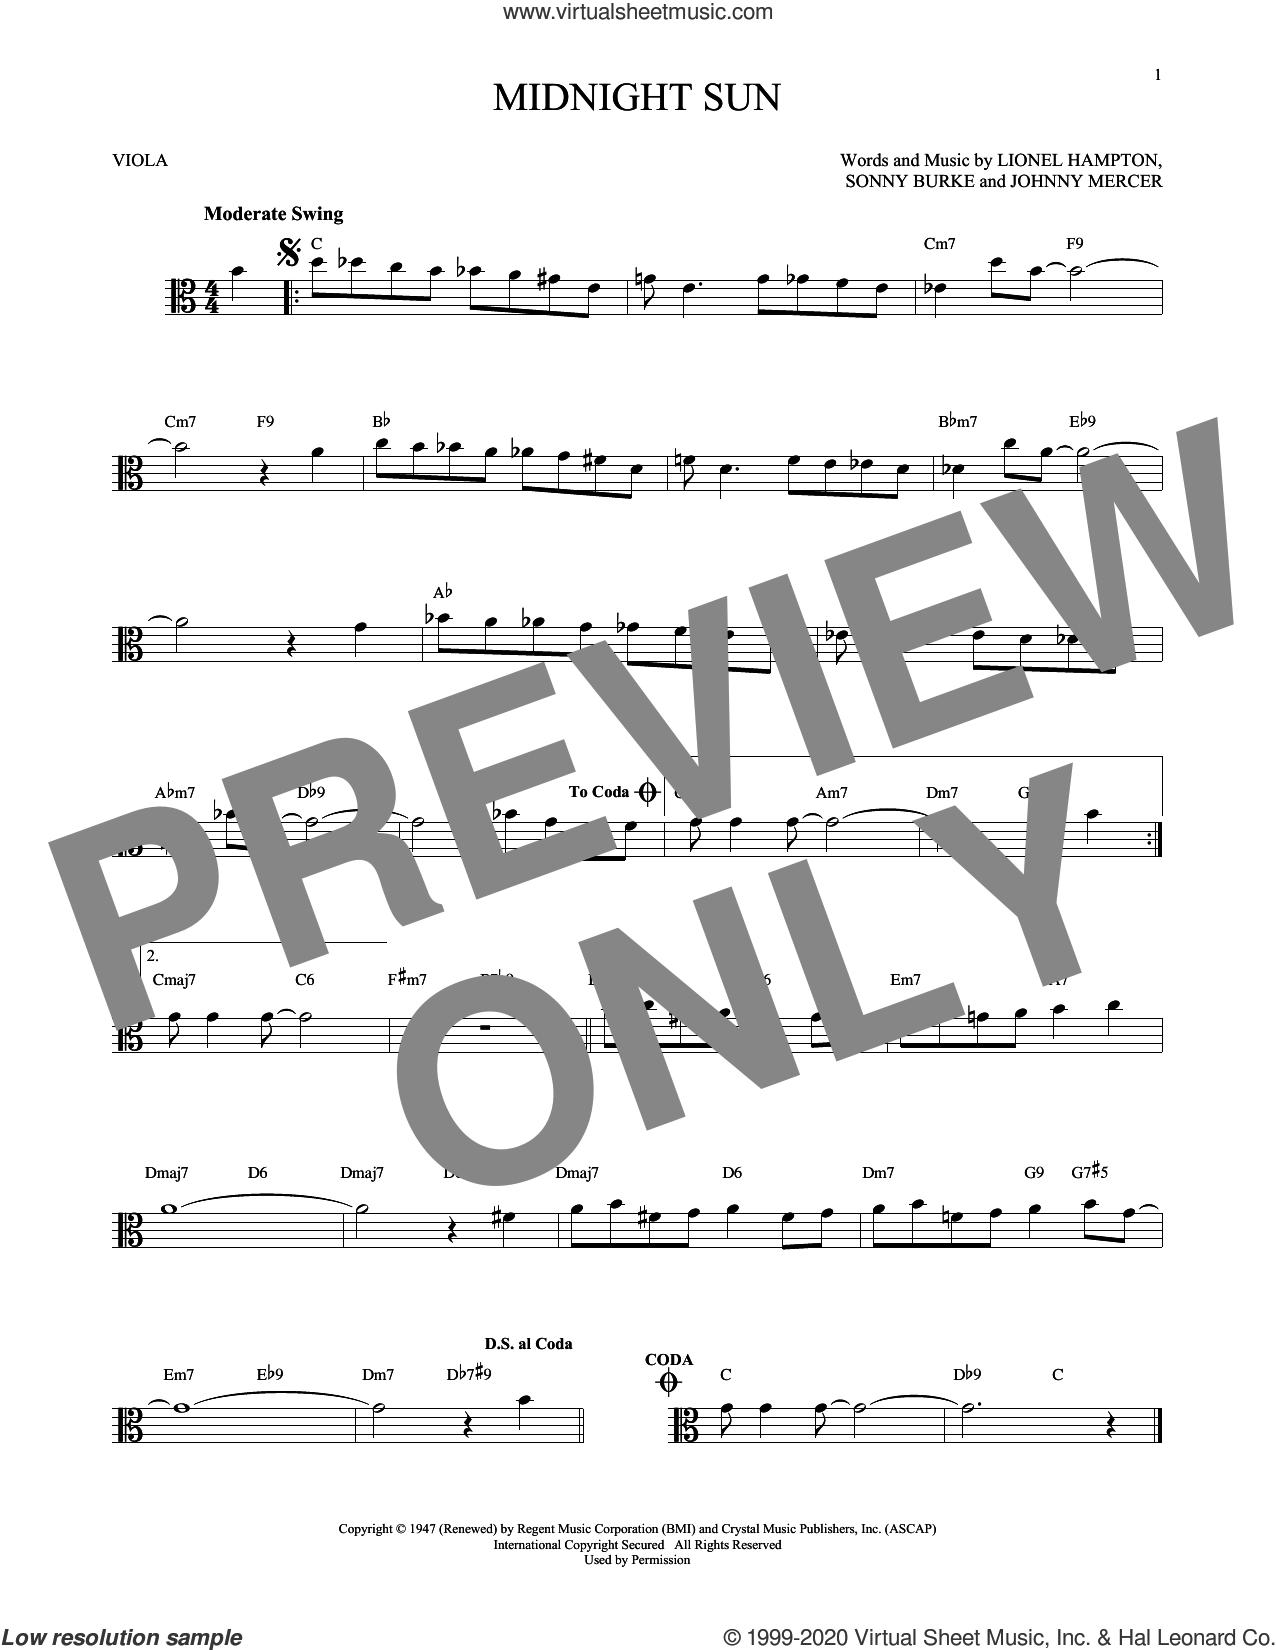 Midnight Sun sheet music for viola solo by Johnny Mercer, Lionel Hampton and Sonny Burke, intermediate skill level